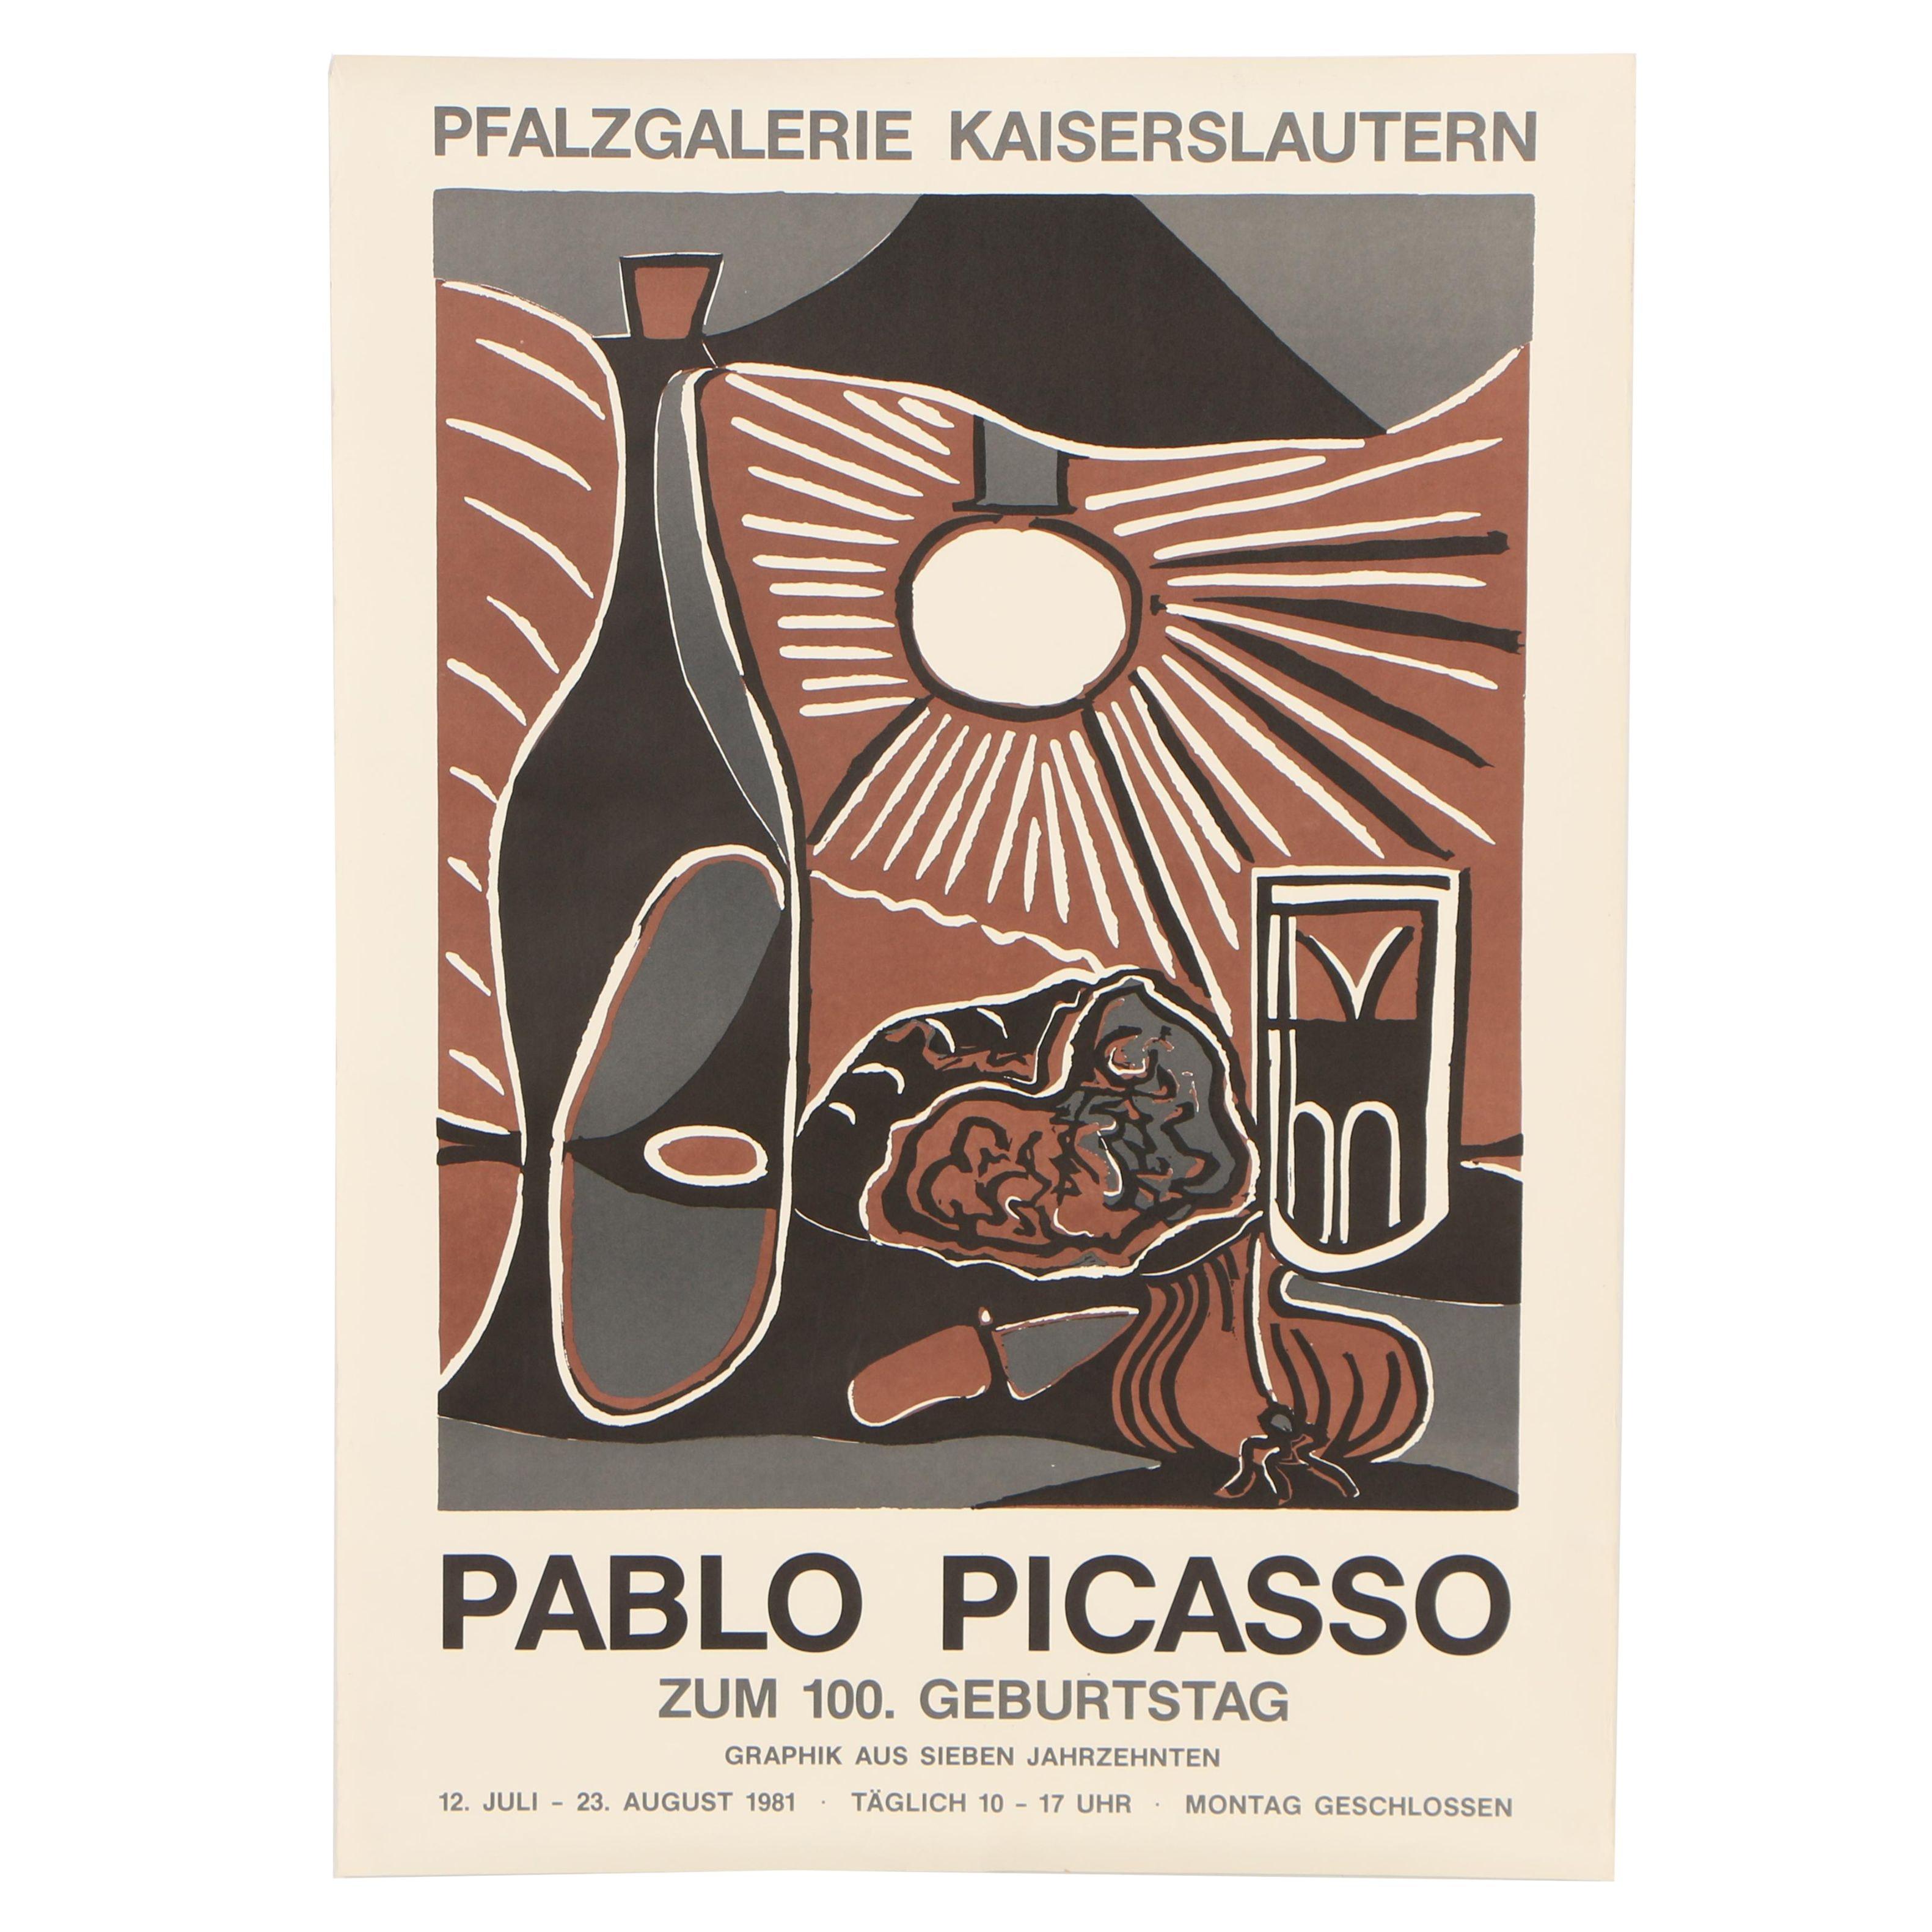 German Retrospective Exhibition Poster After Pablo Picasso